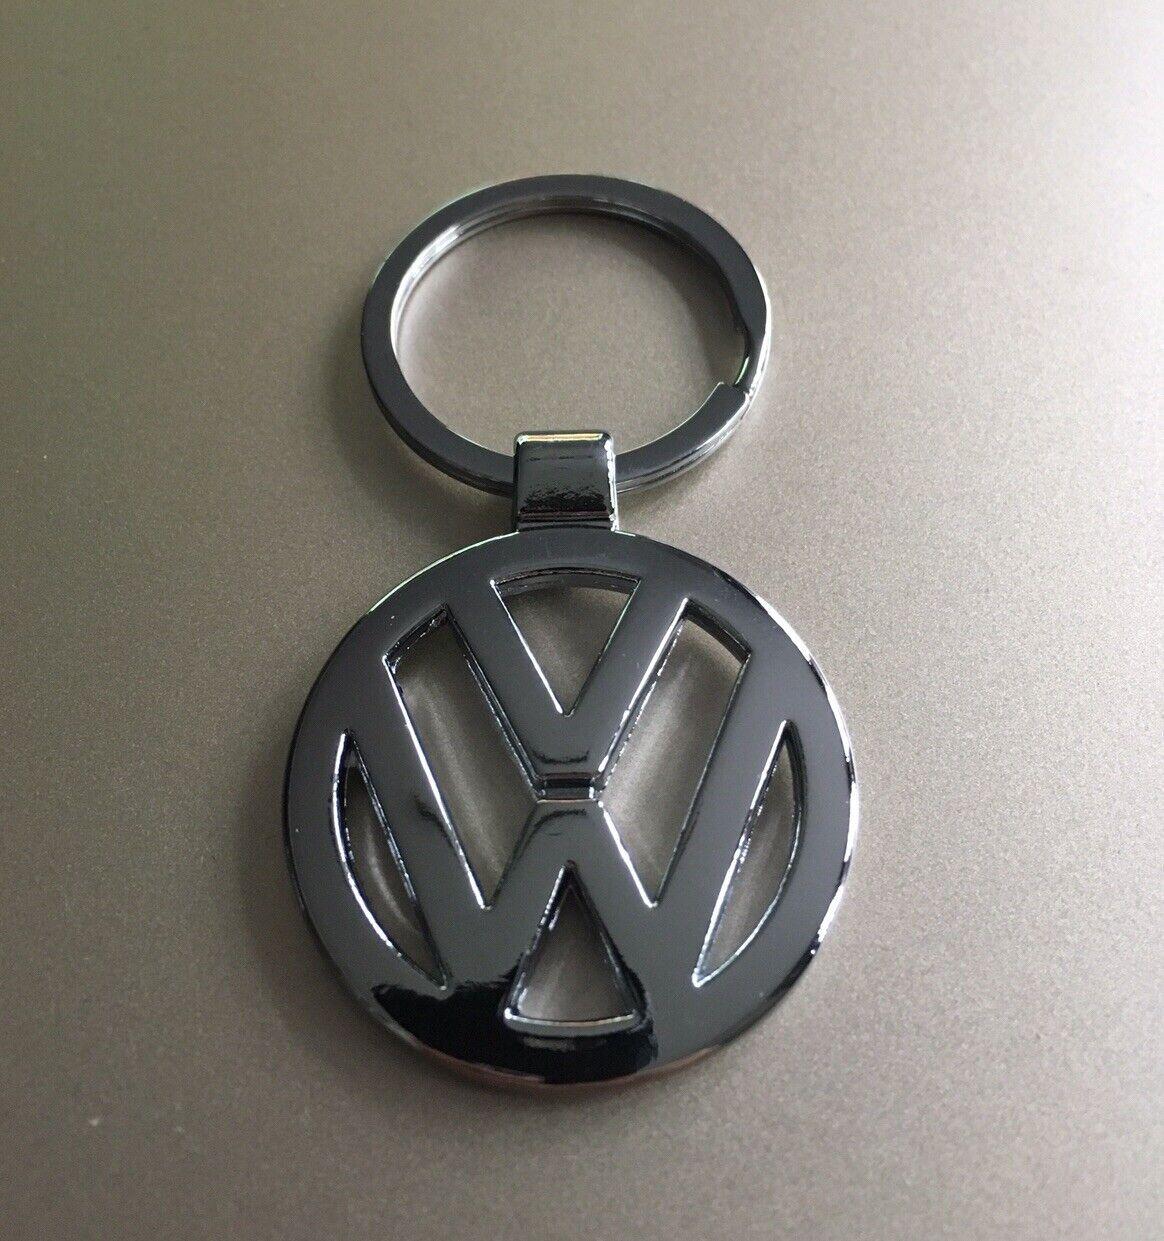 'VOLKSWAGEN' Keyring Chrome Keychain Official Logo Silver Key Ring Car Chain